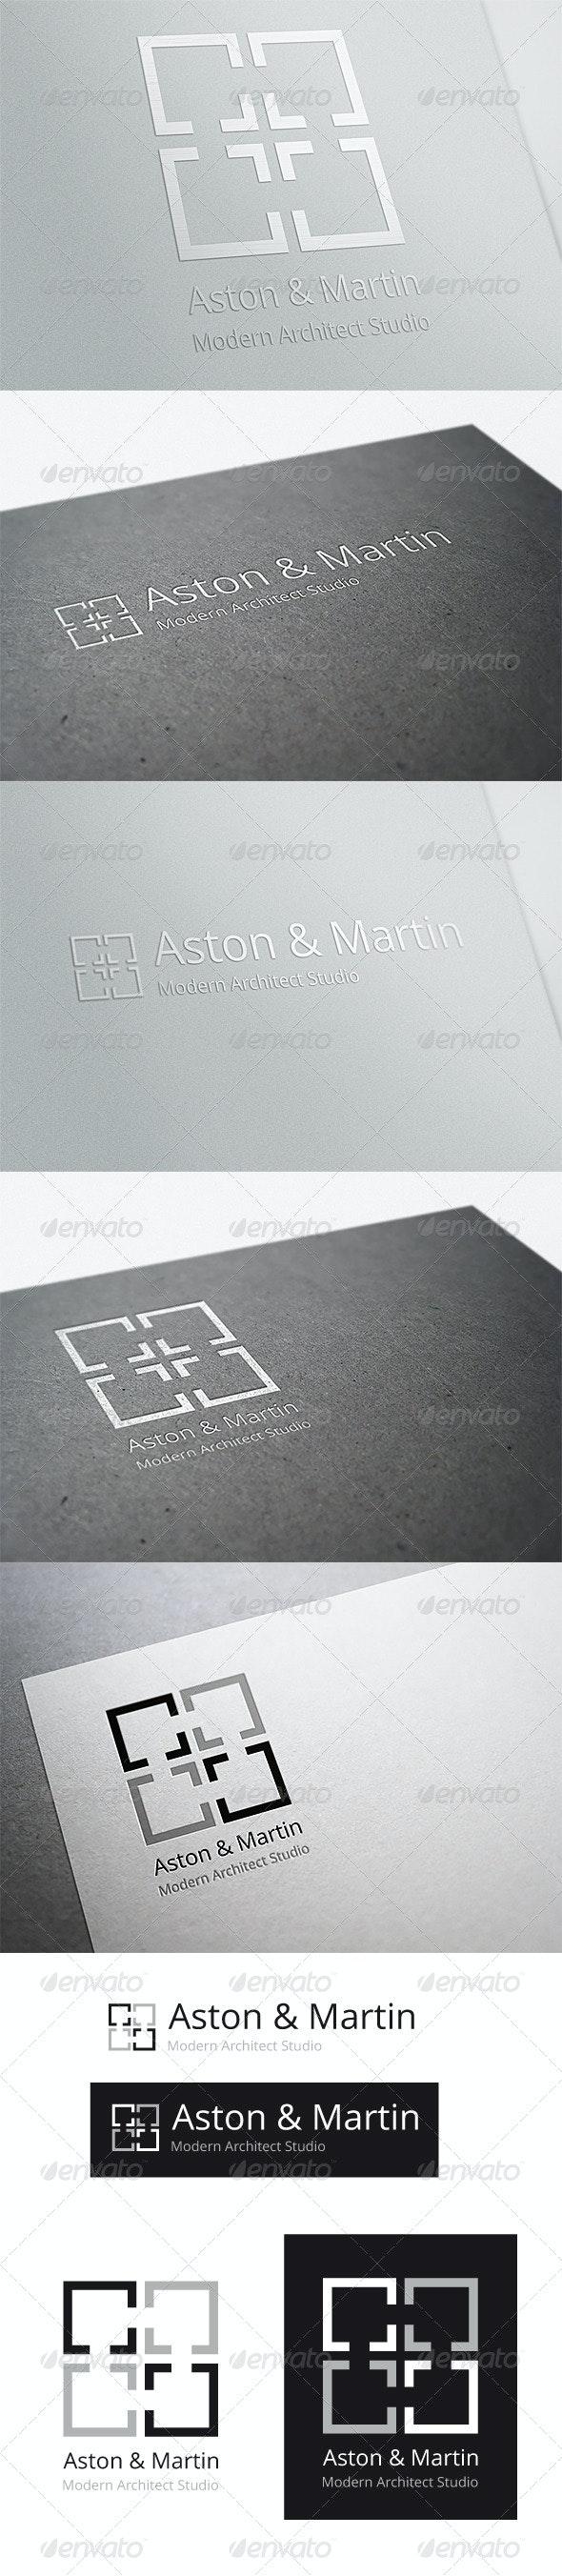 Modern Architect Studio - Vector Abstract